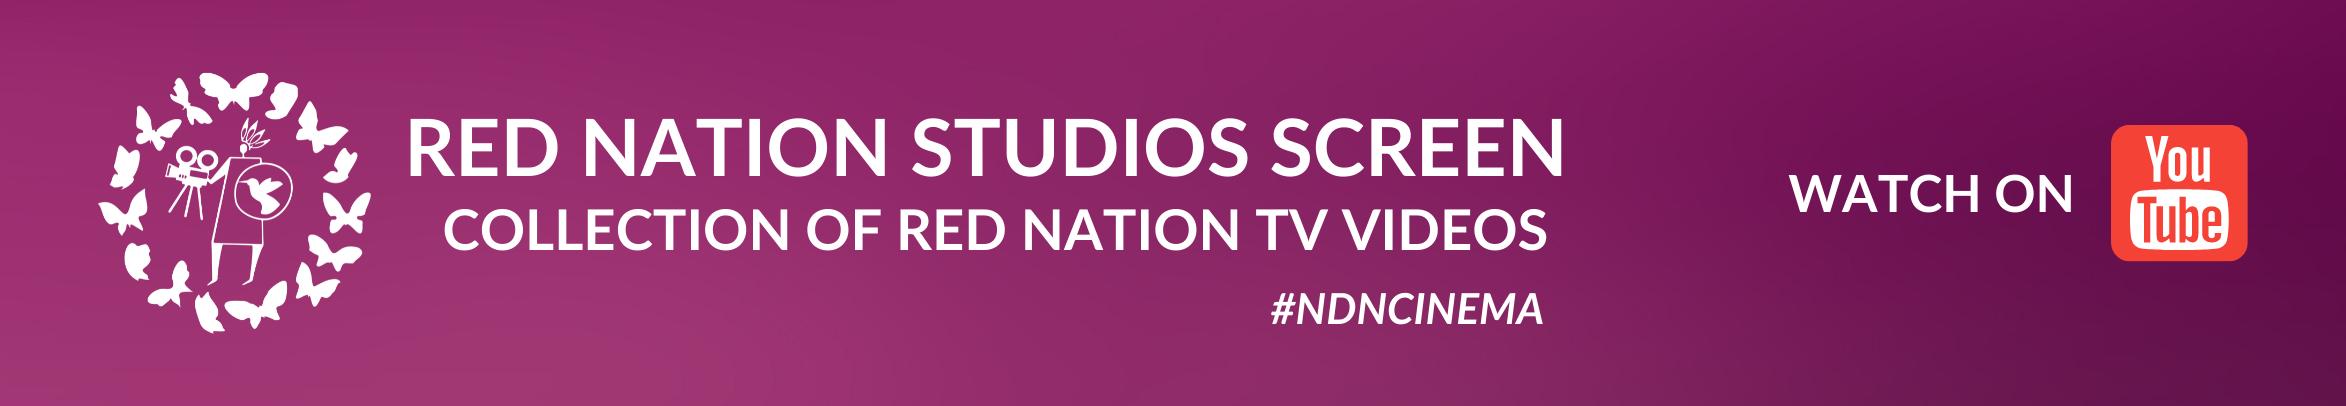 RNTV Banner